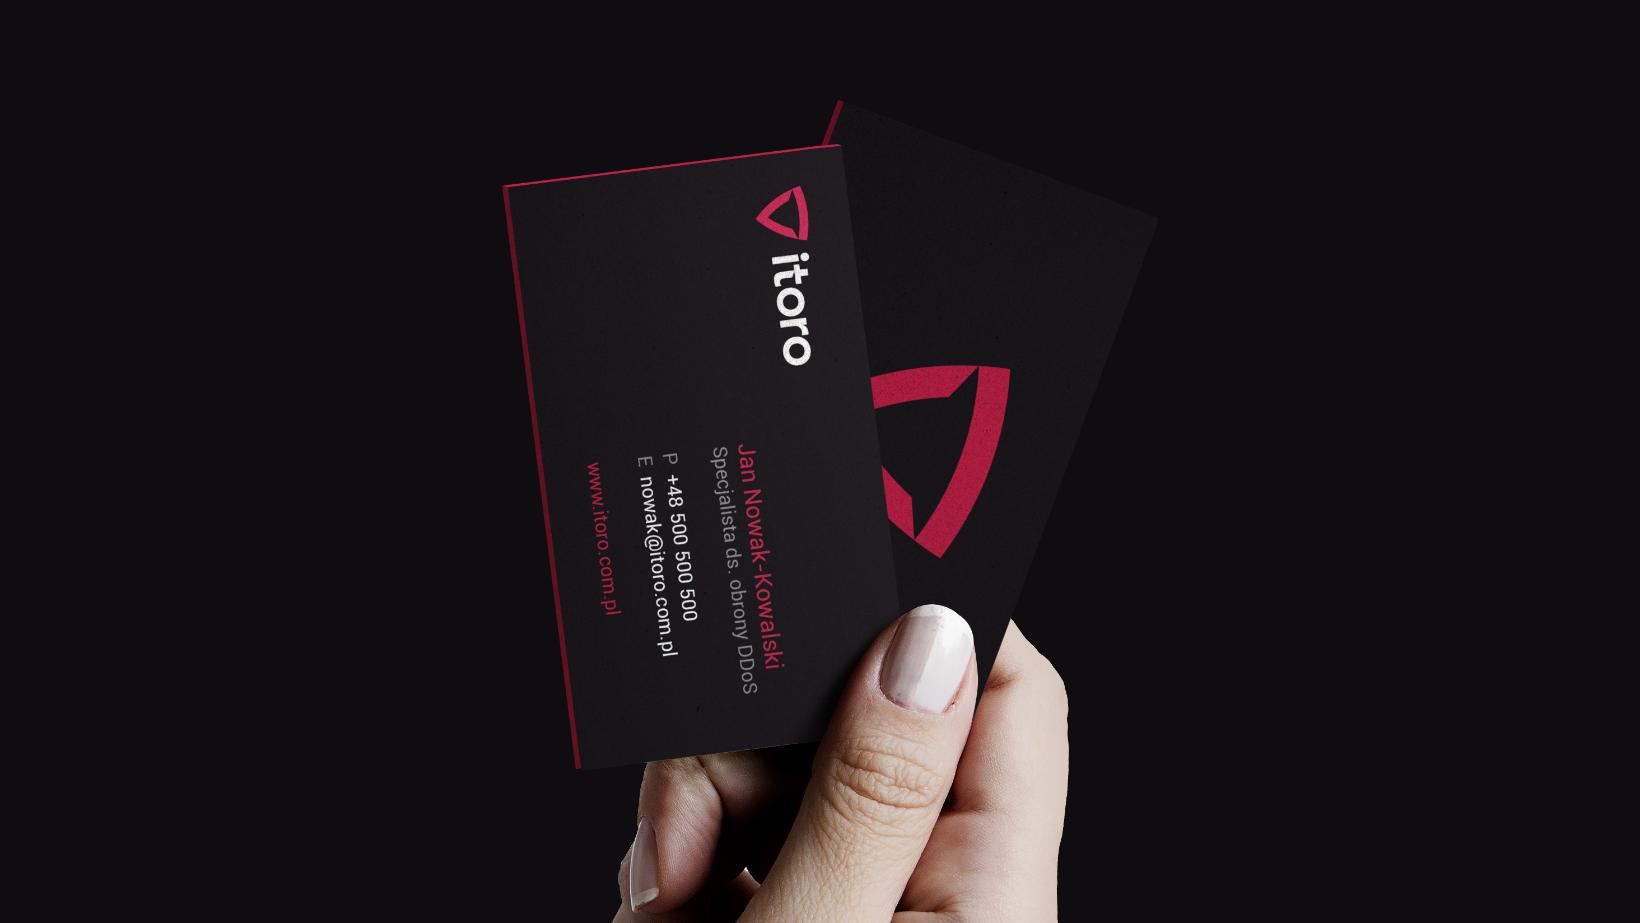 Dominik-Pacholczyk-Brand-Idenity-Design-Consultancy-ITORO-19